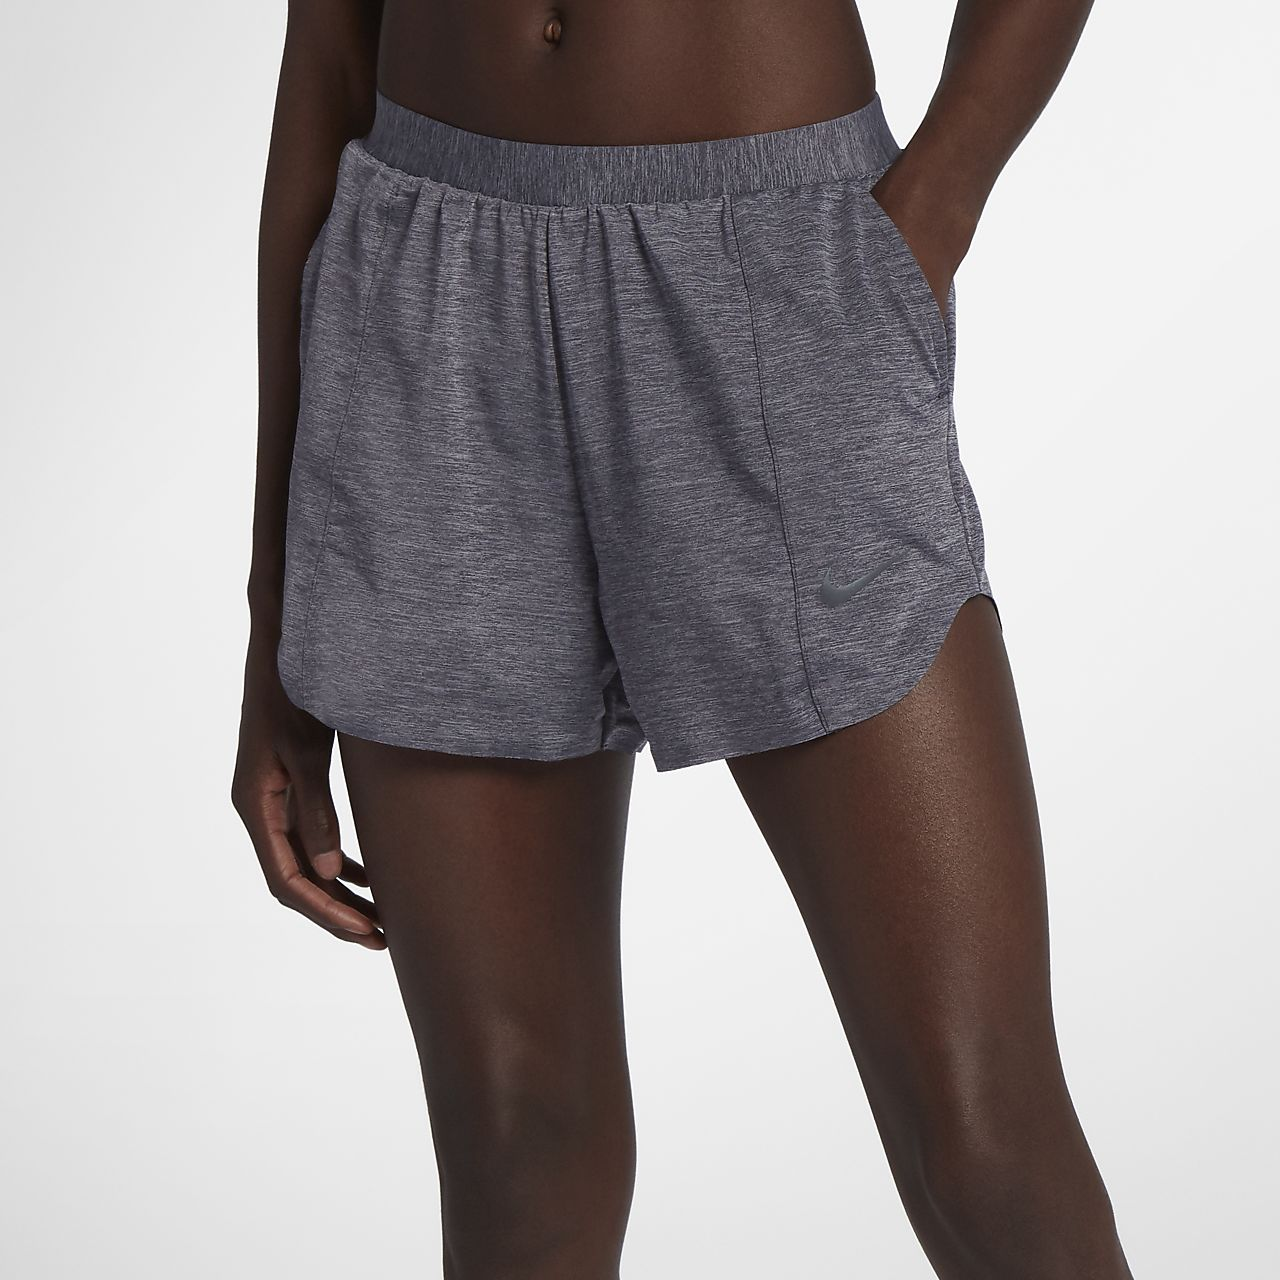 Nike Run Division Women's Running Shorts